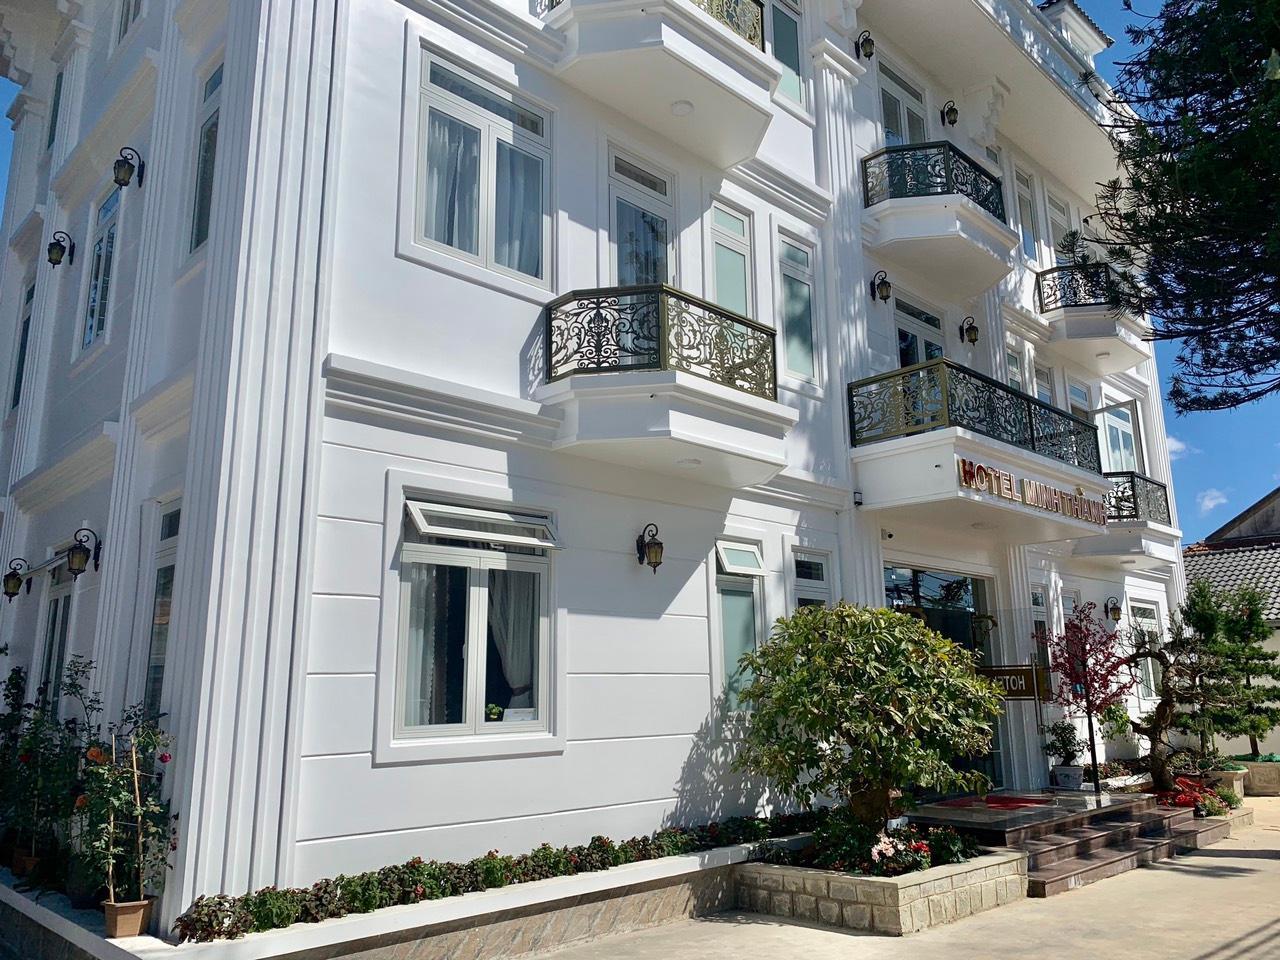 7S Hotel Minh Thanh Dalat